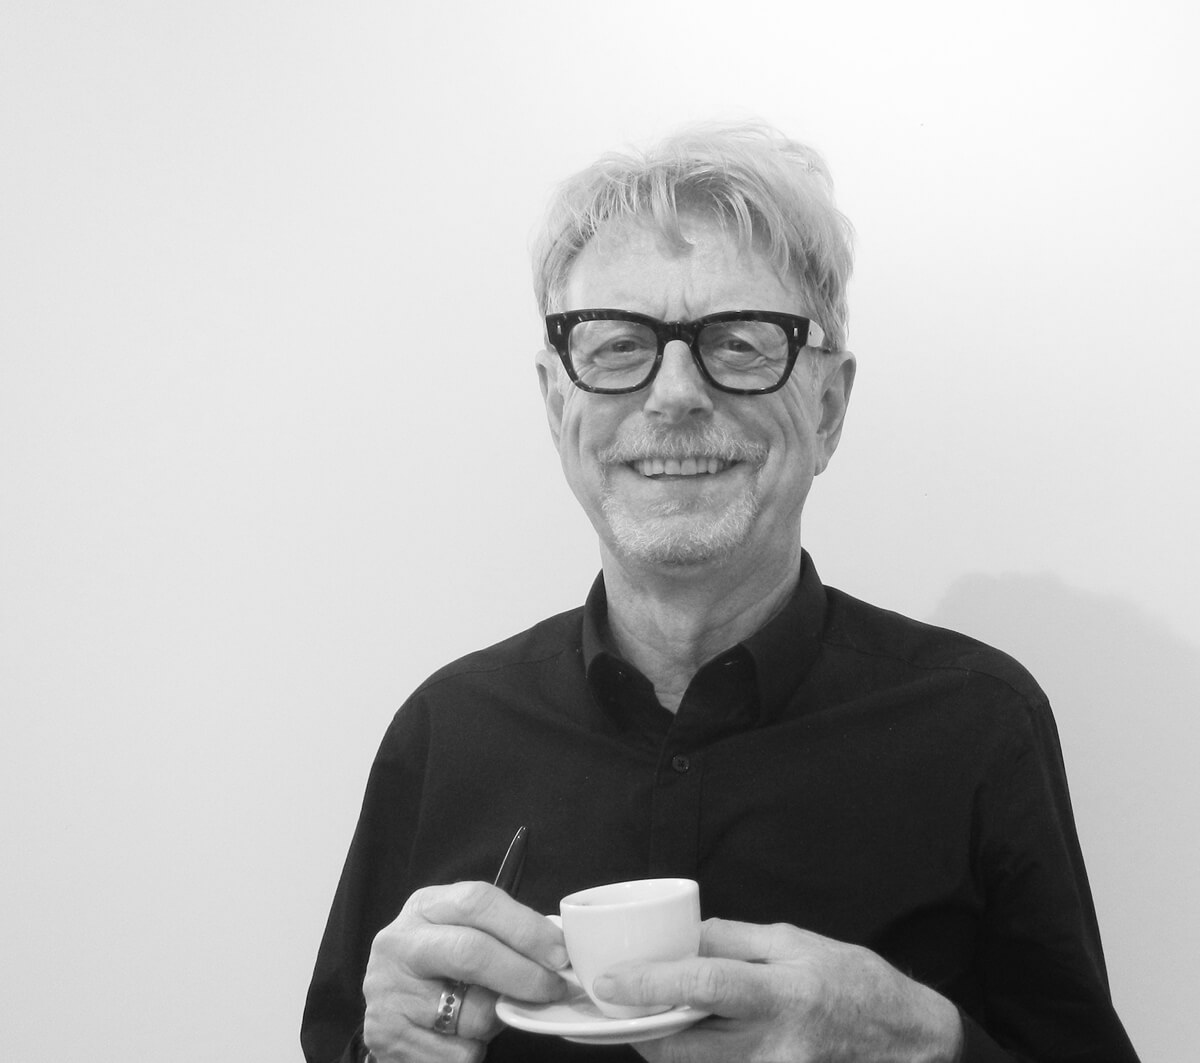 Portret Niels Greif FromAtoB